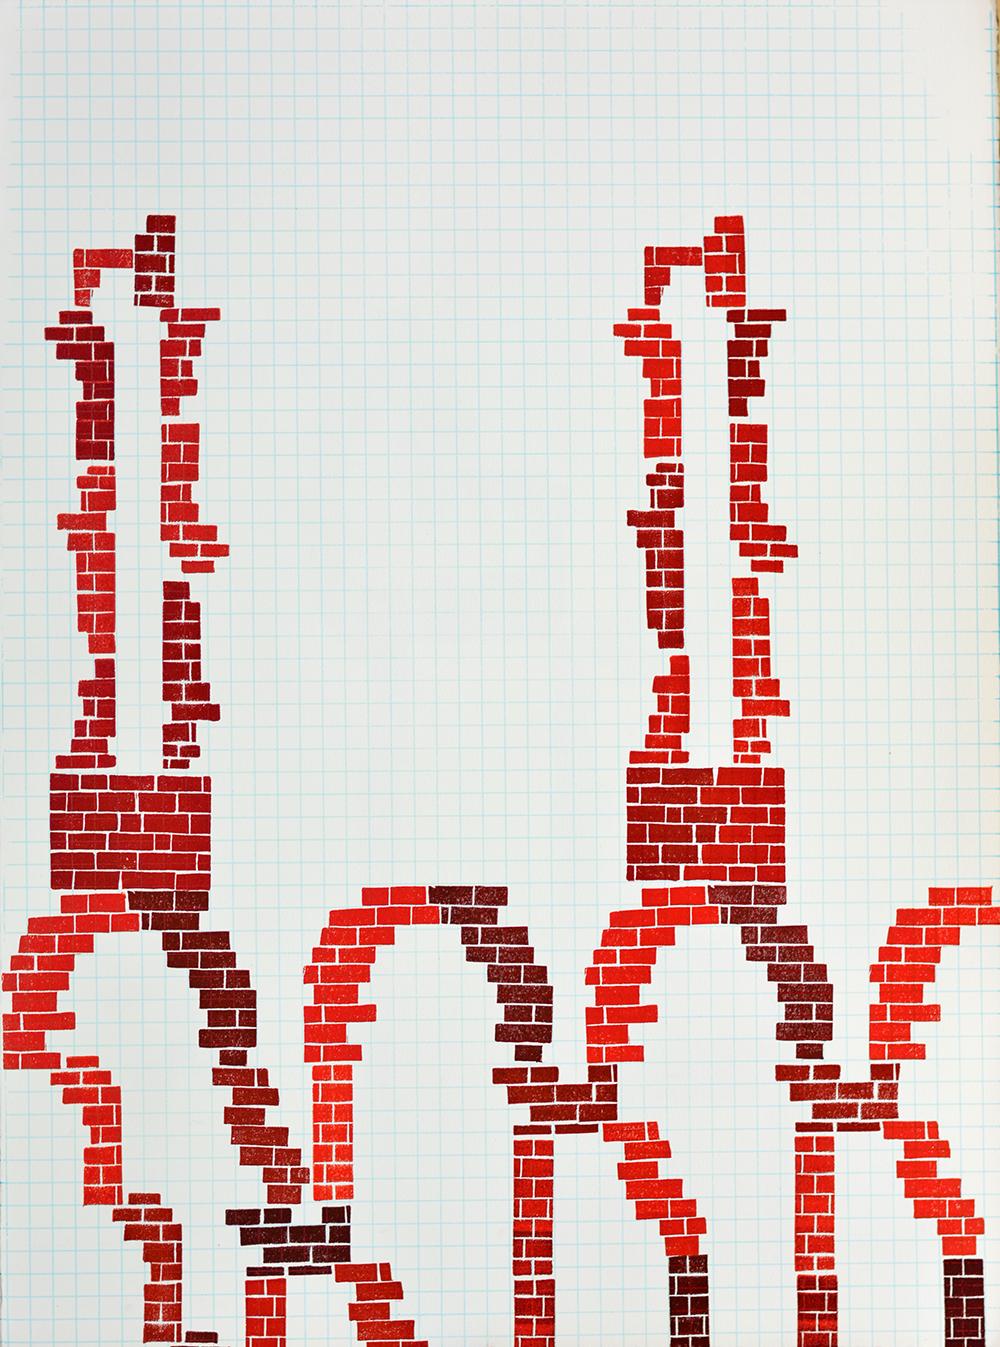 ruin grid 5.jpg